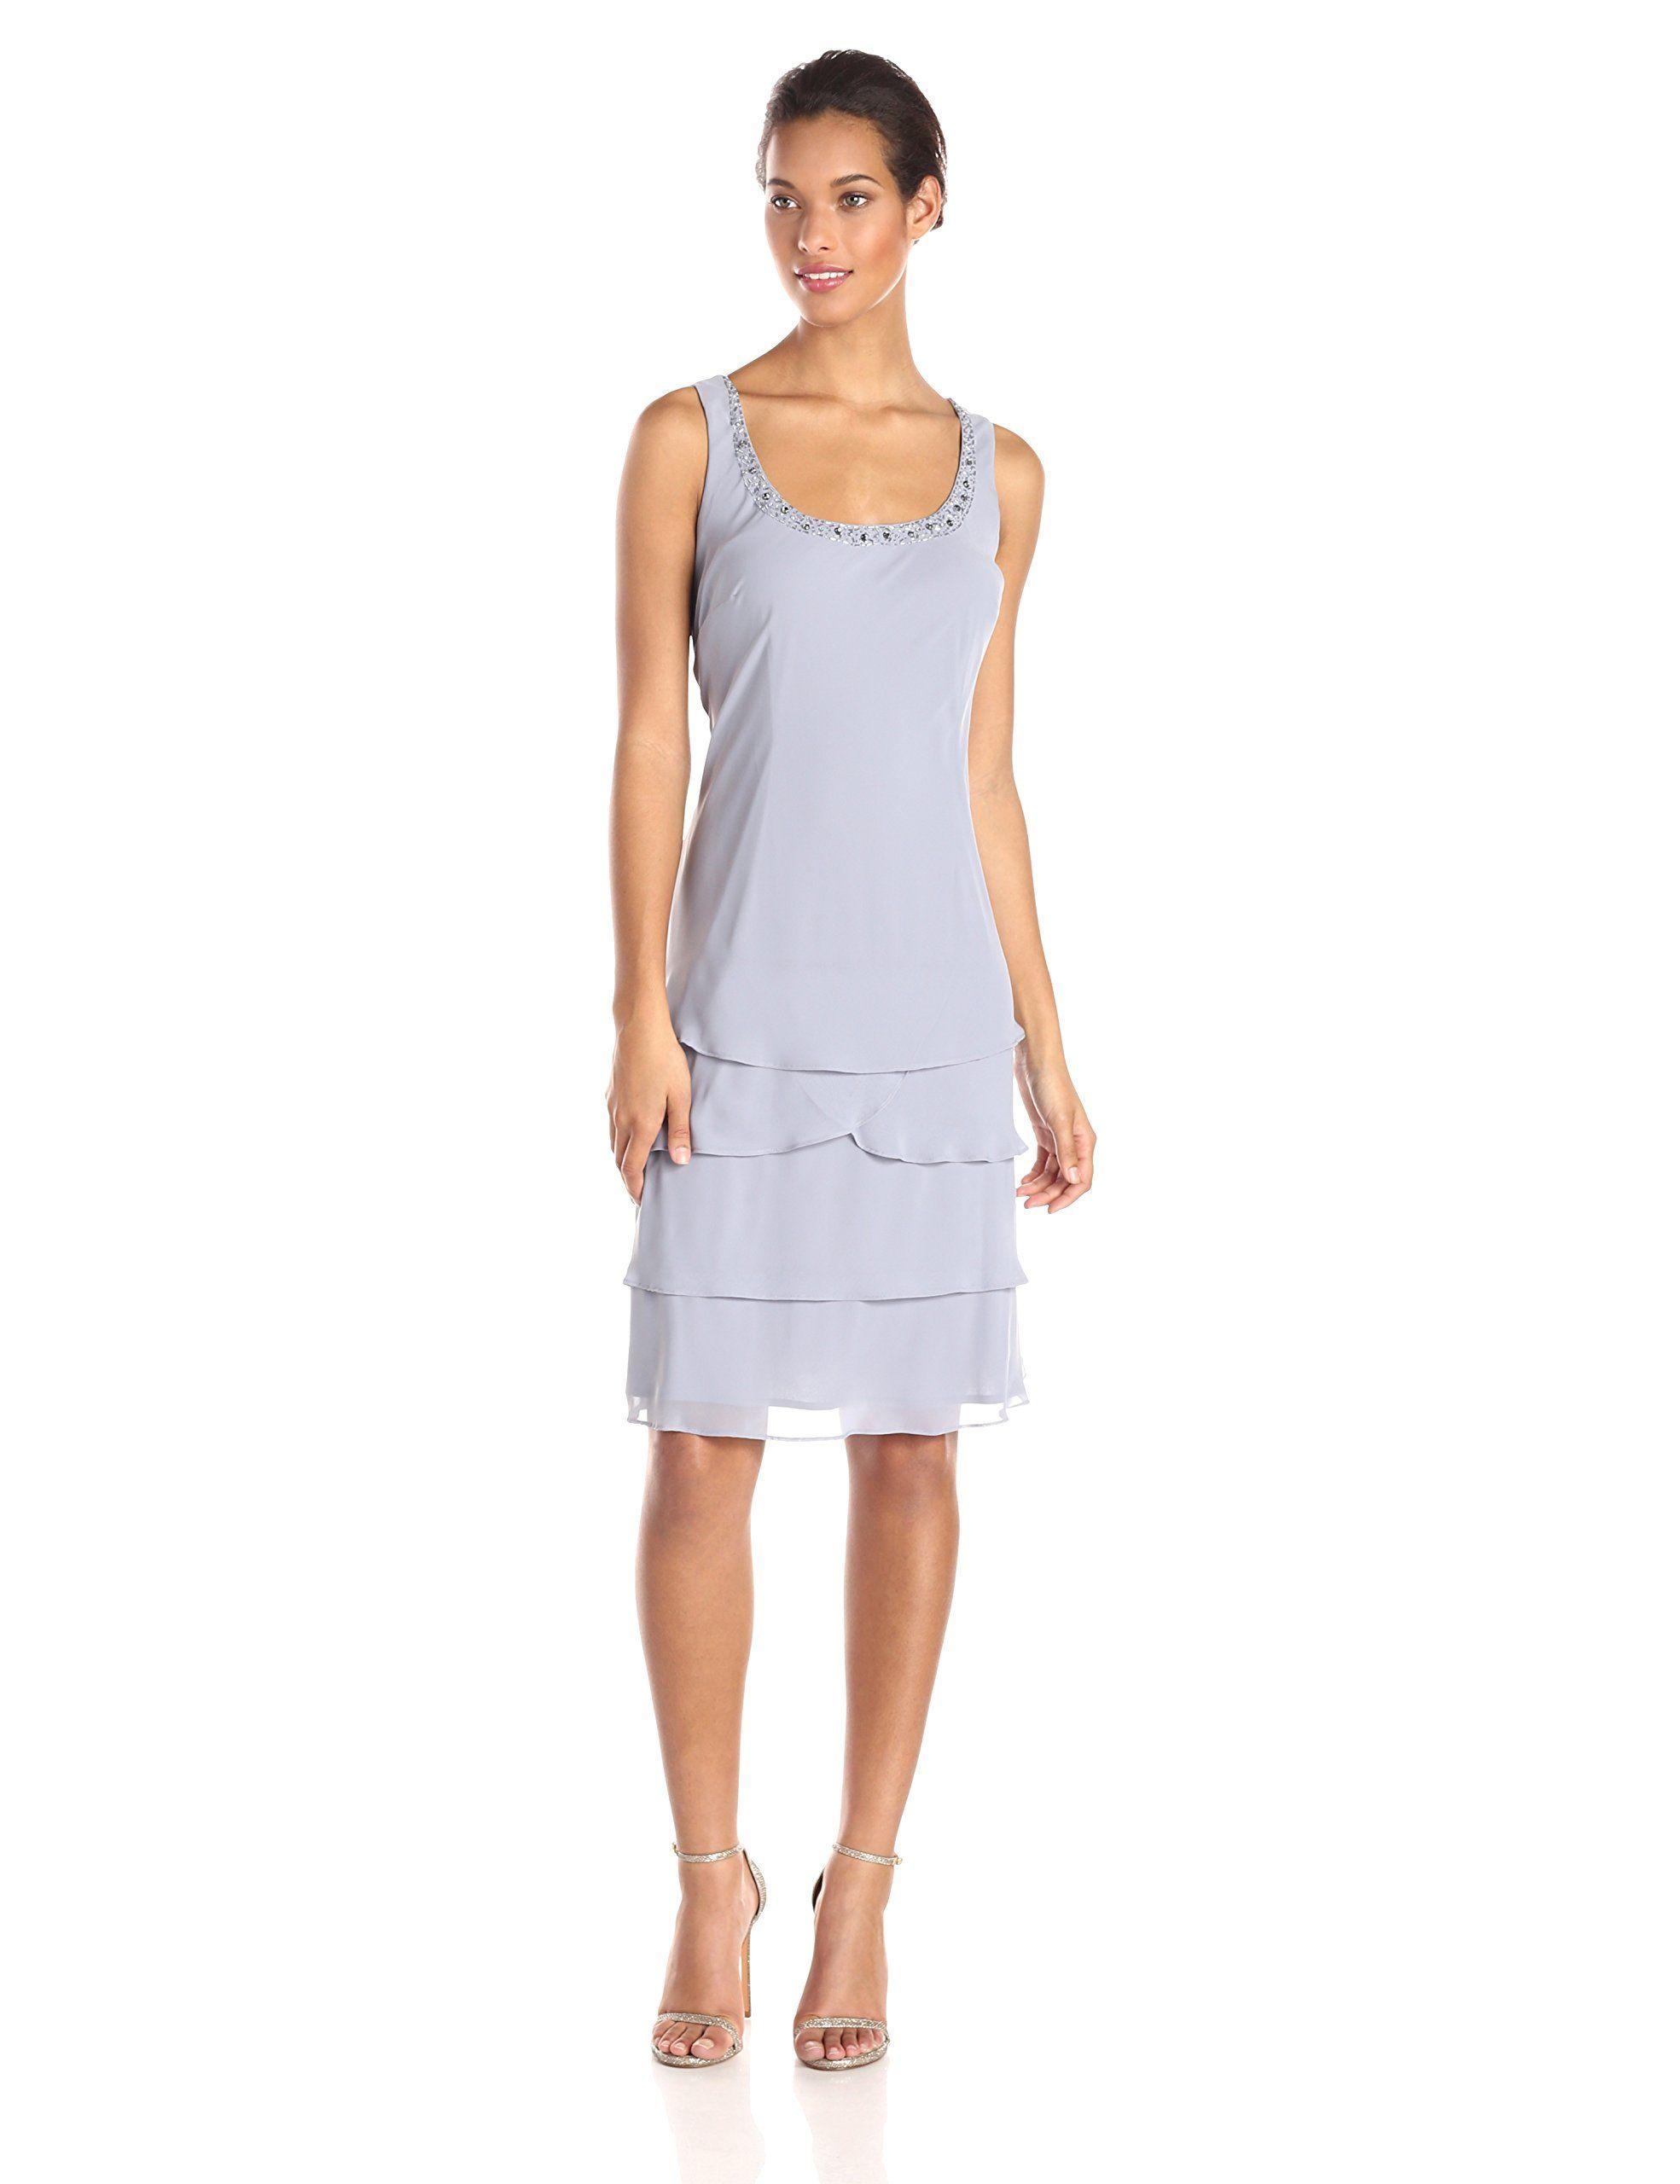 petite-evening-wear-womens